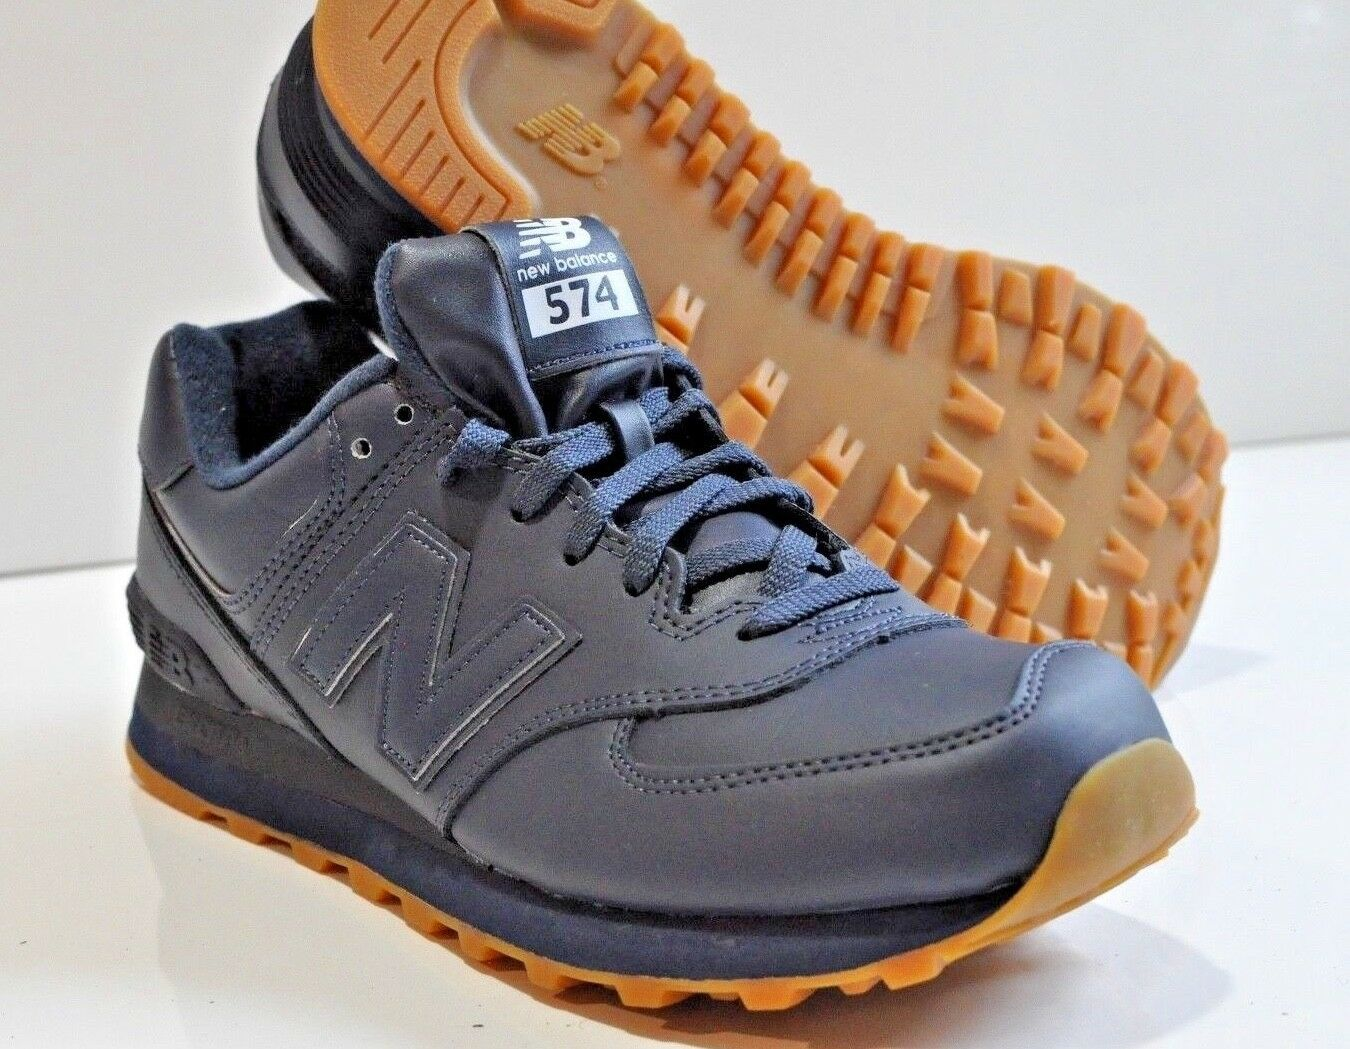 New balance 2018 Zapatillas Classics Fresh foam sole Runner Zapatillas 2018 negro Negro mfl2018bg 81805d